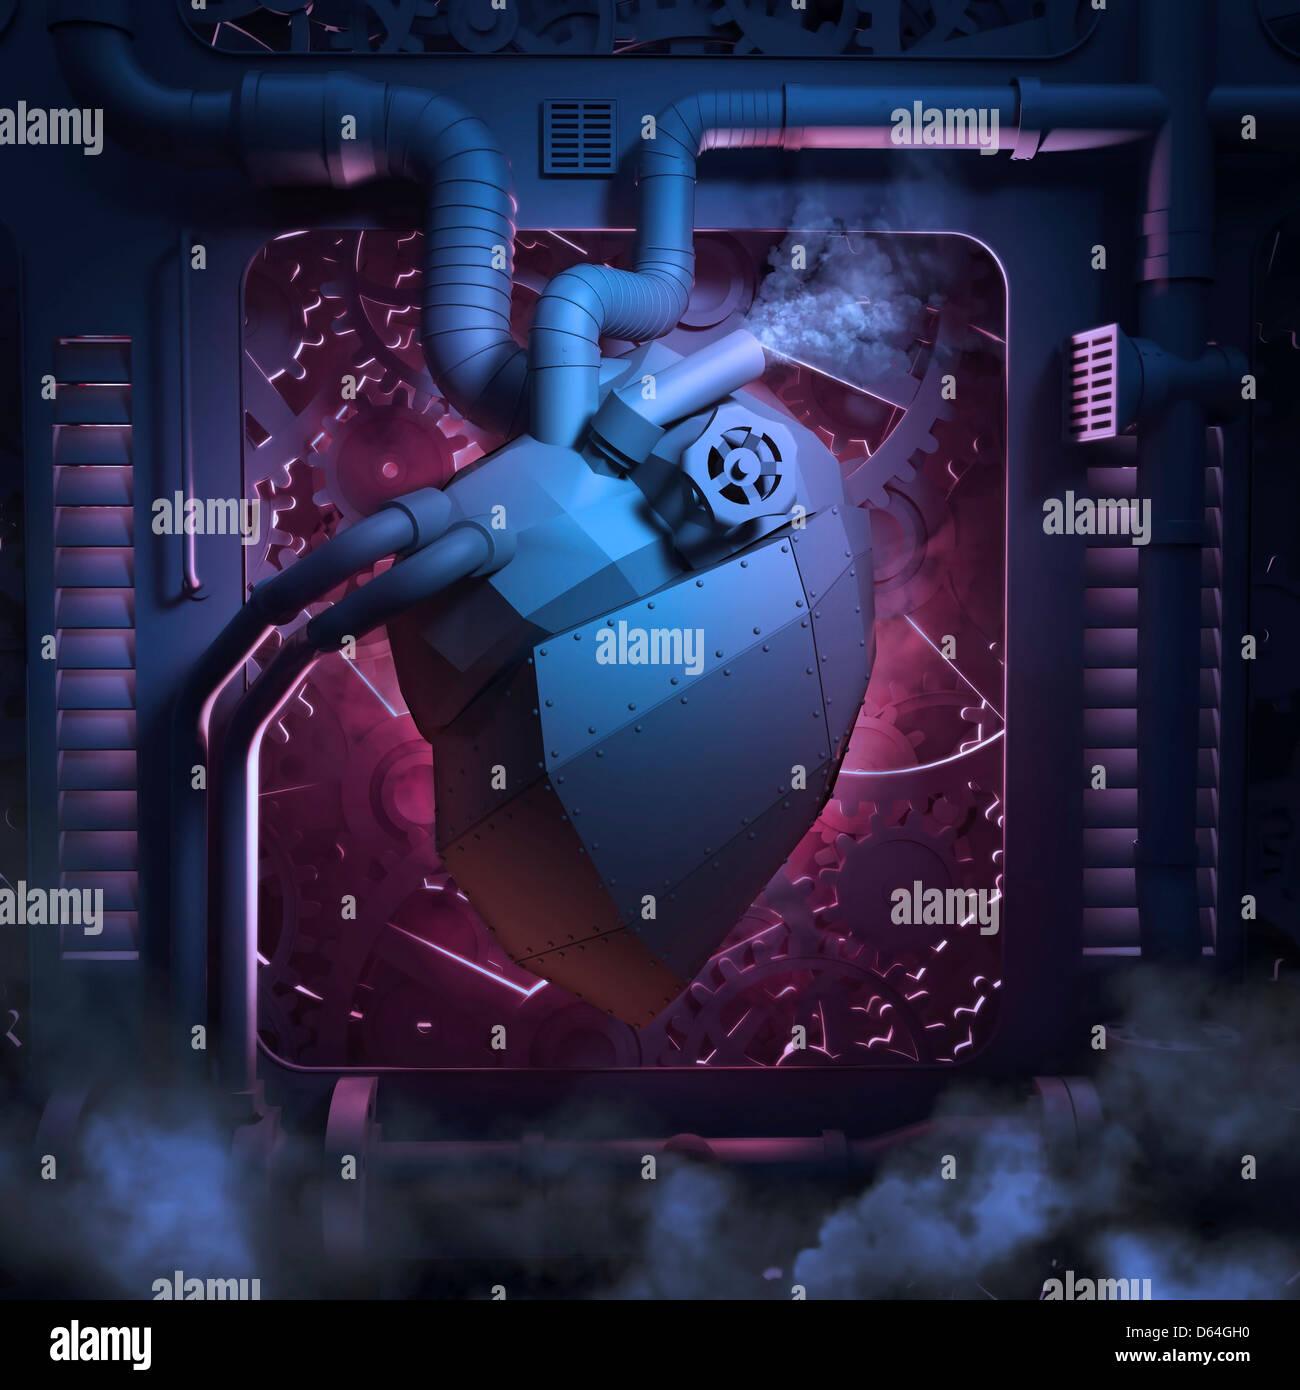 Mechanisches Herz, konzeptuellen Kunstwerk Stockbild